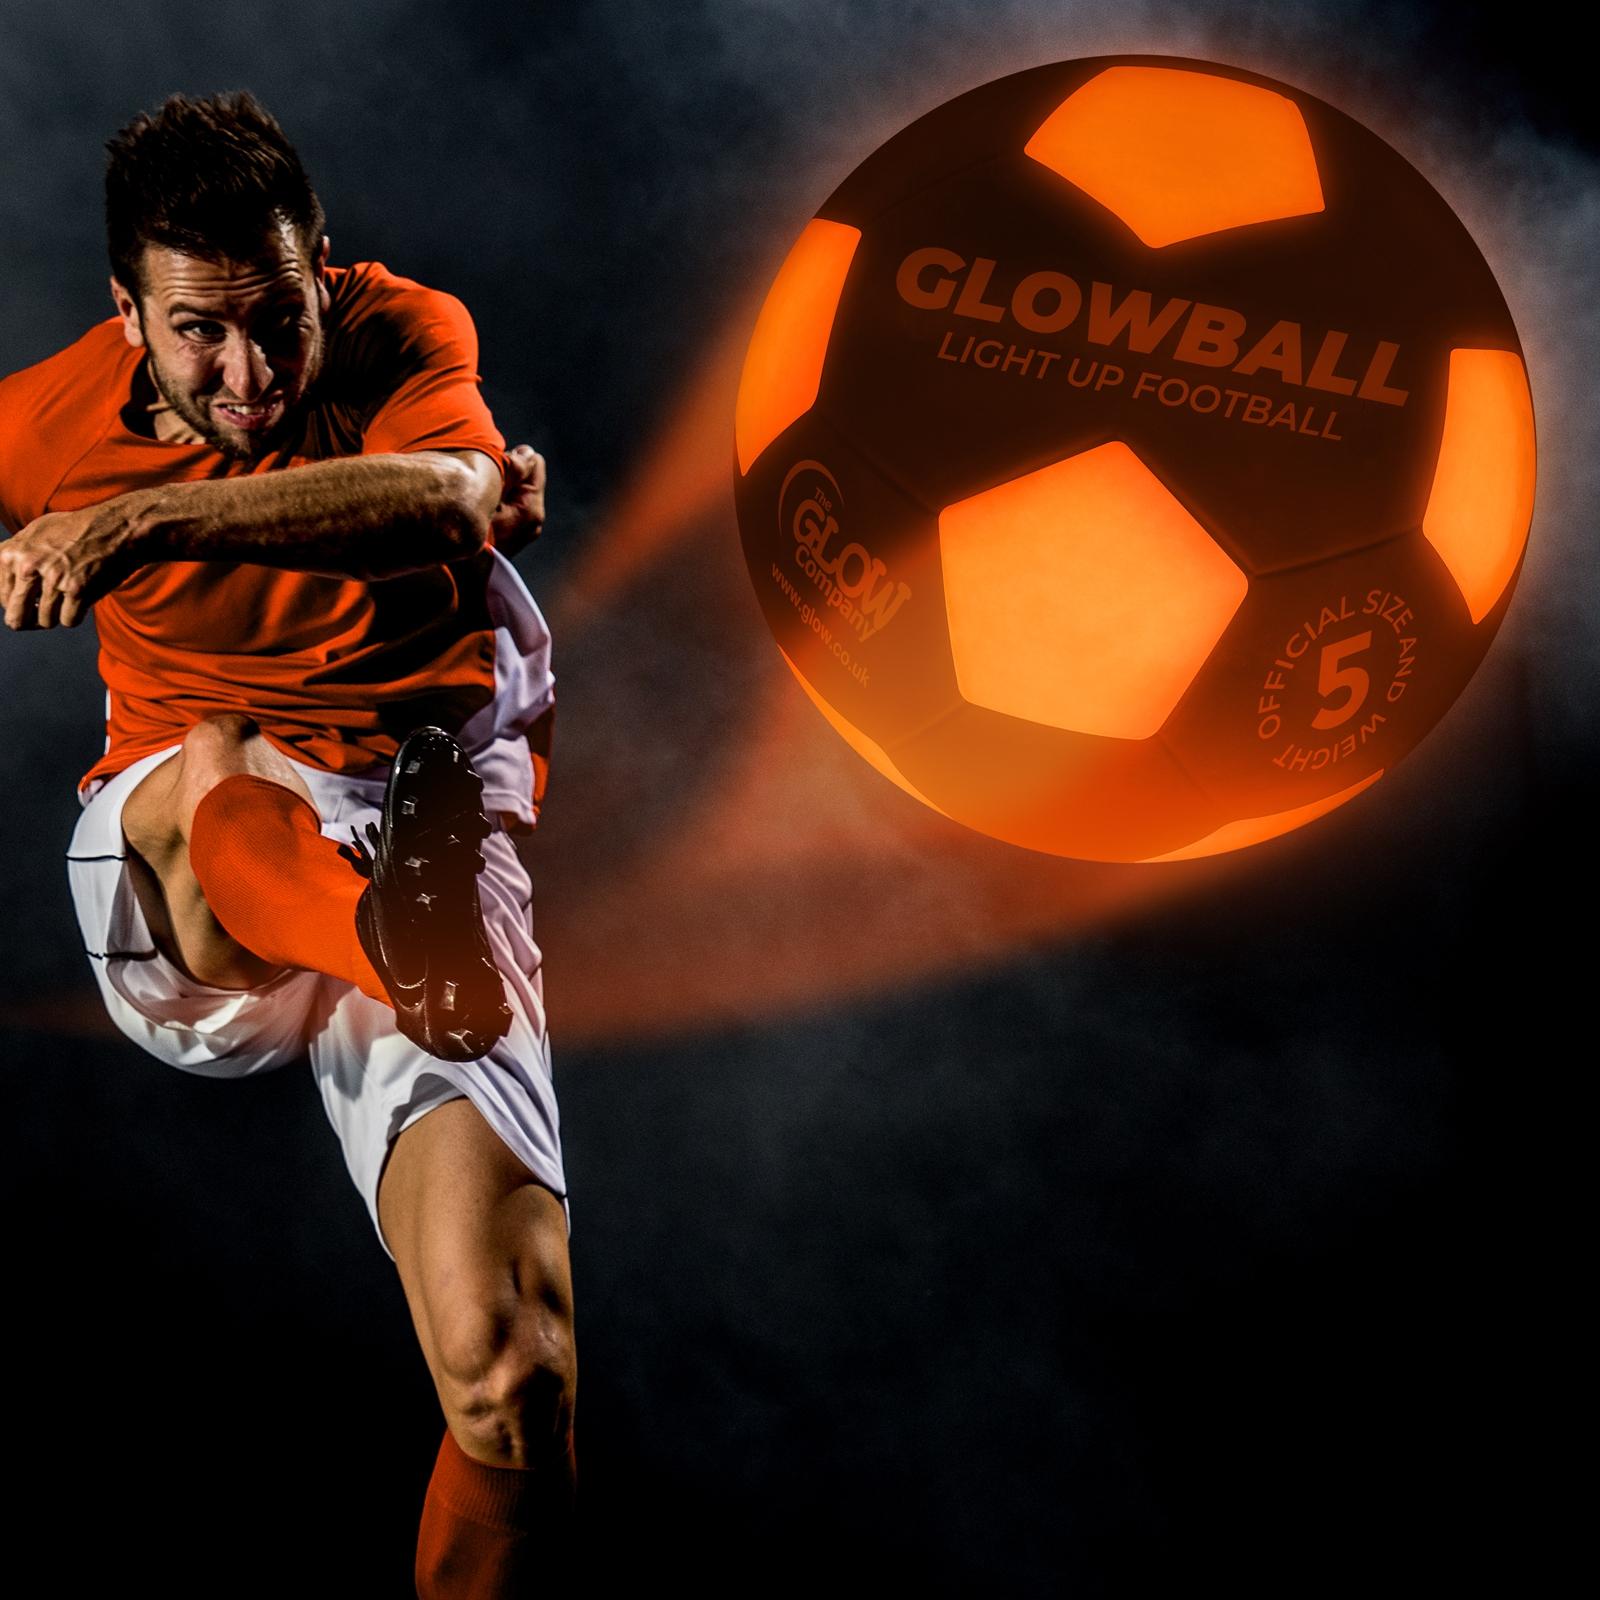 Light Up Football Glowball